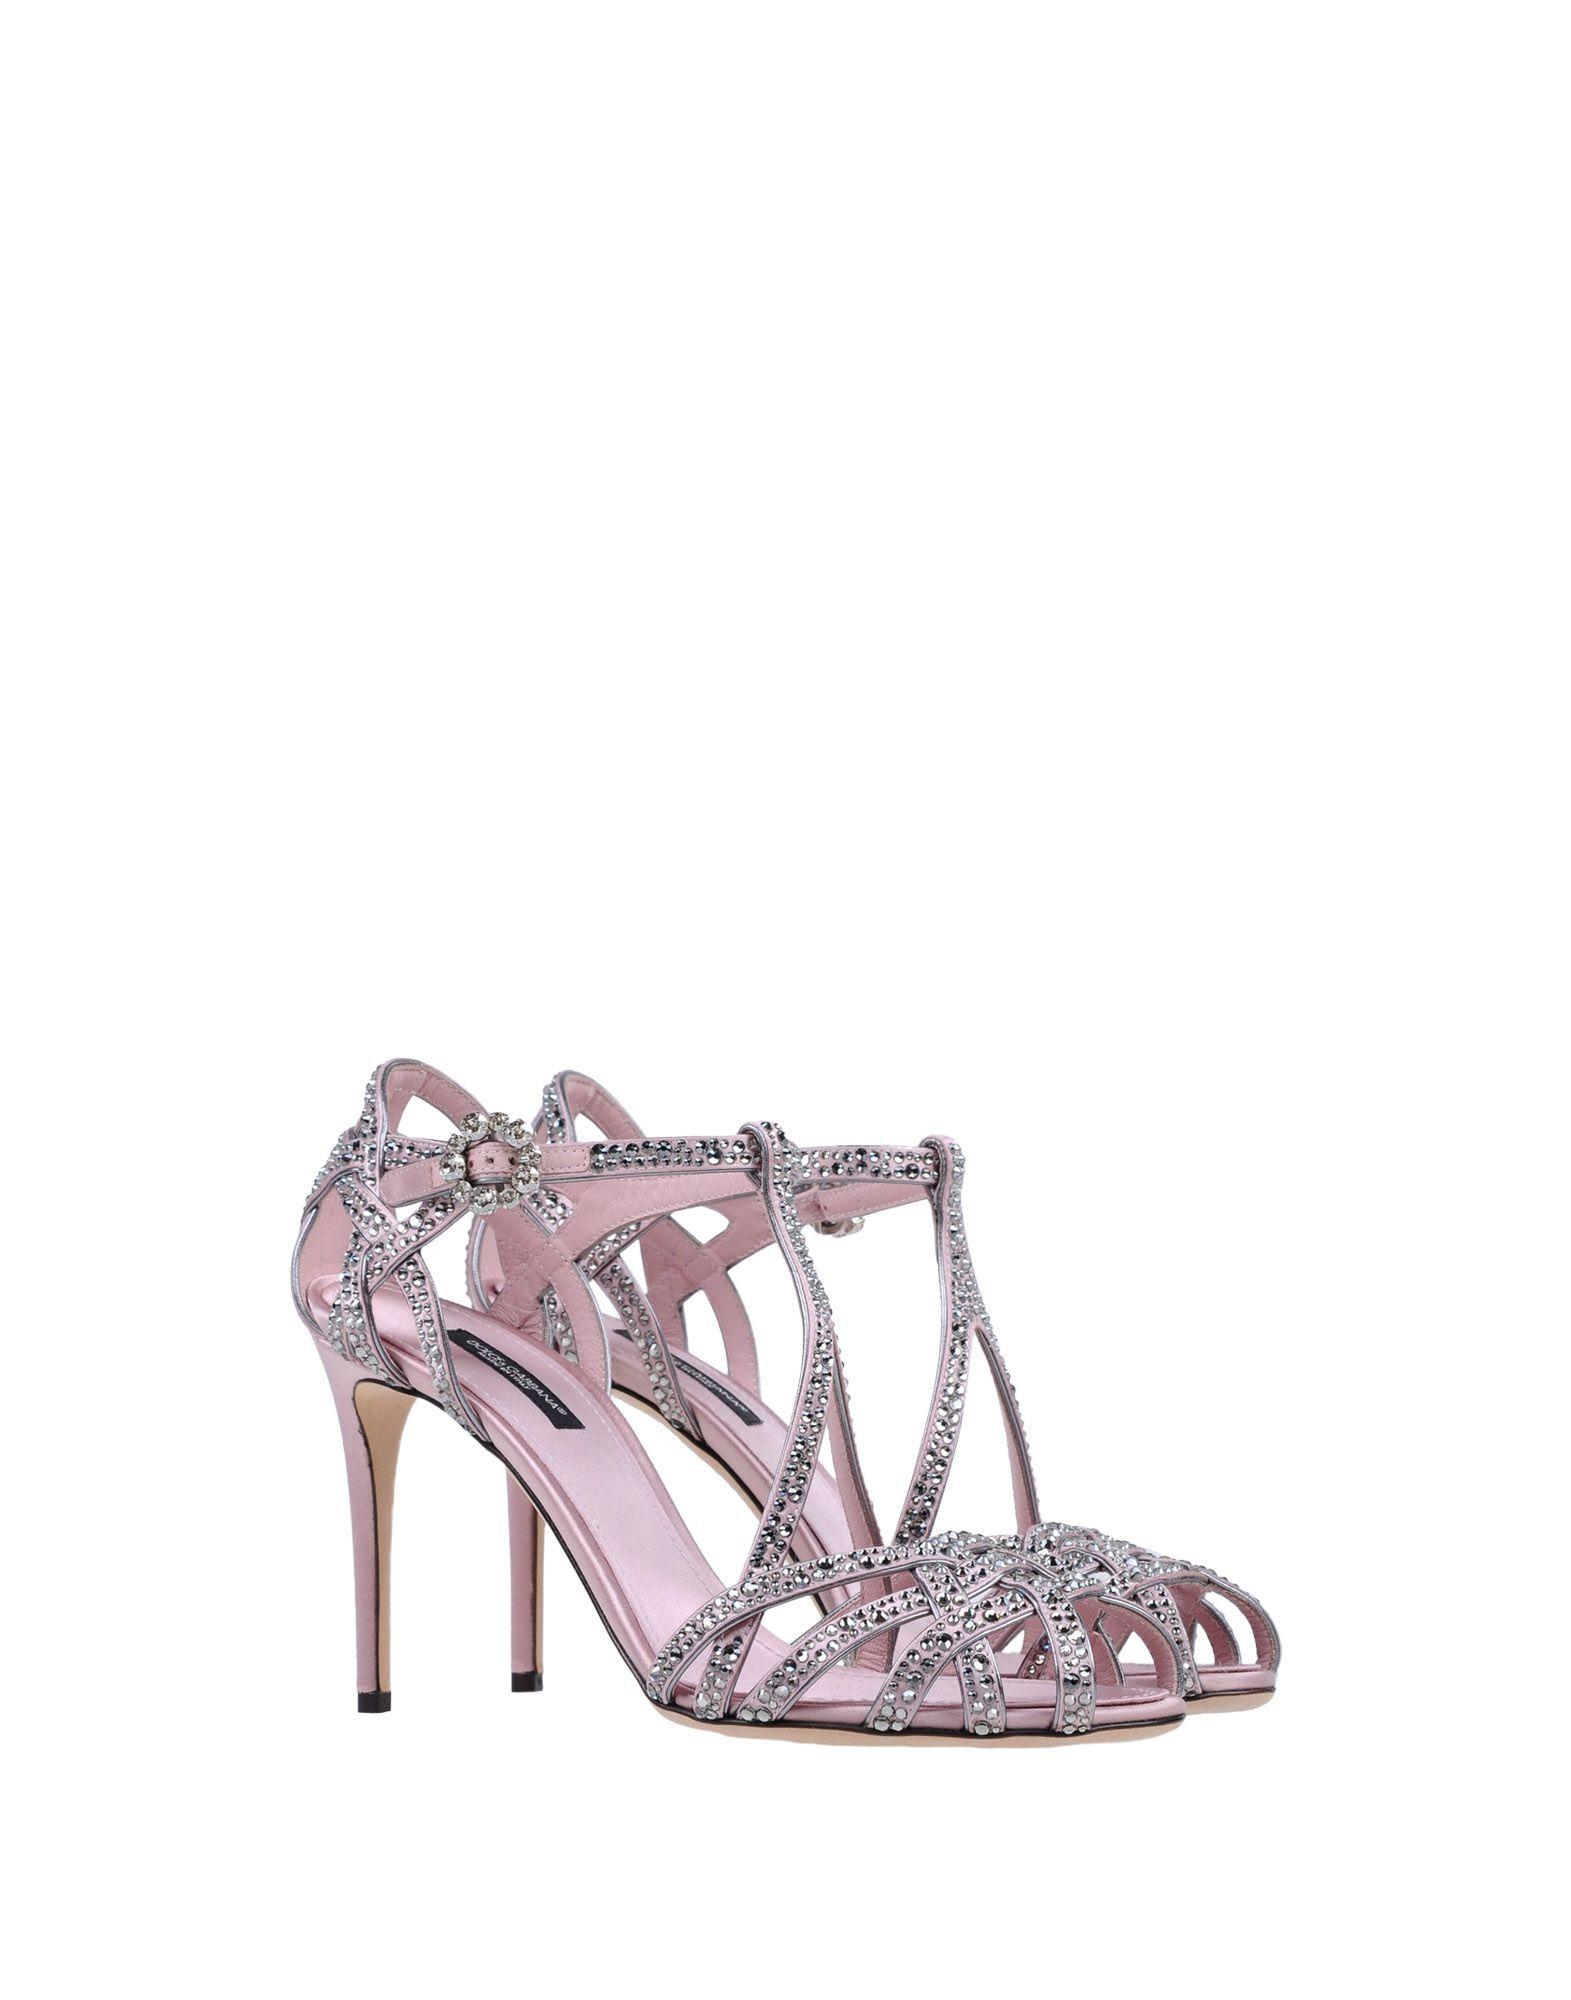 61417bf139f Πέδιλο Dolce & Gabbana Γυναίκα - Πέδιλα Dolce & Gabbana στο YOOX -  11376694RW